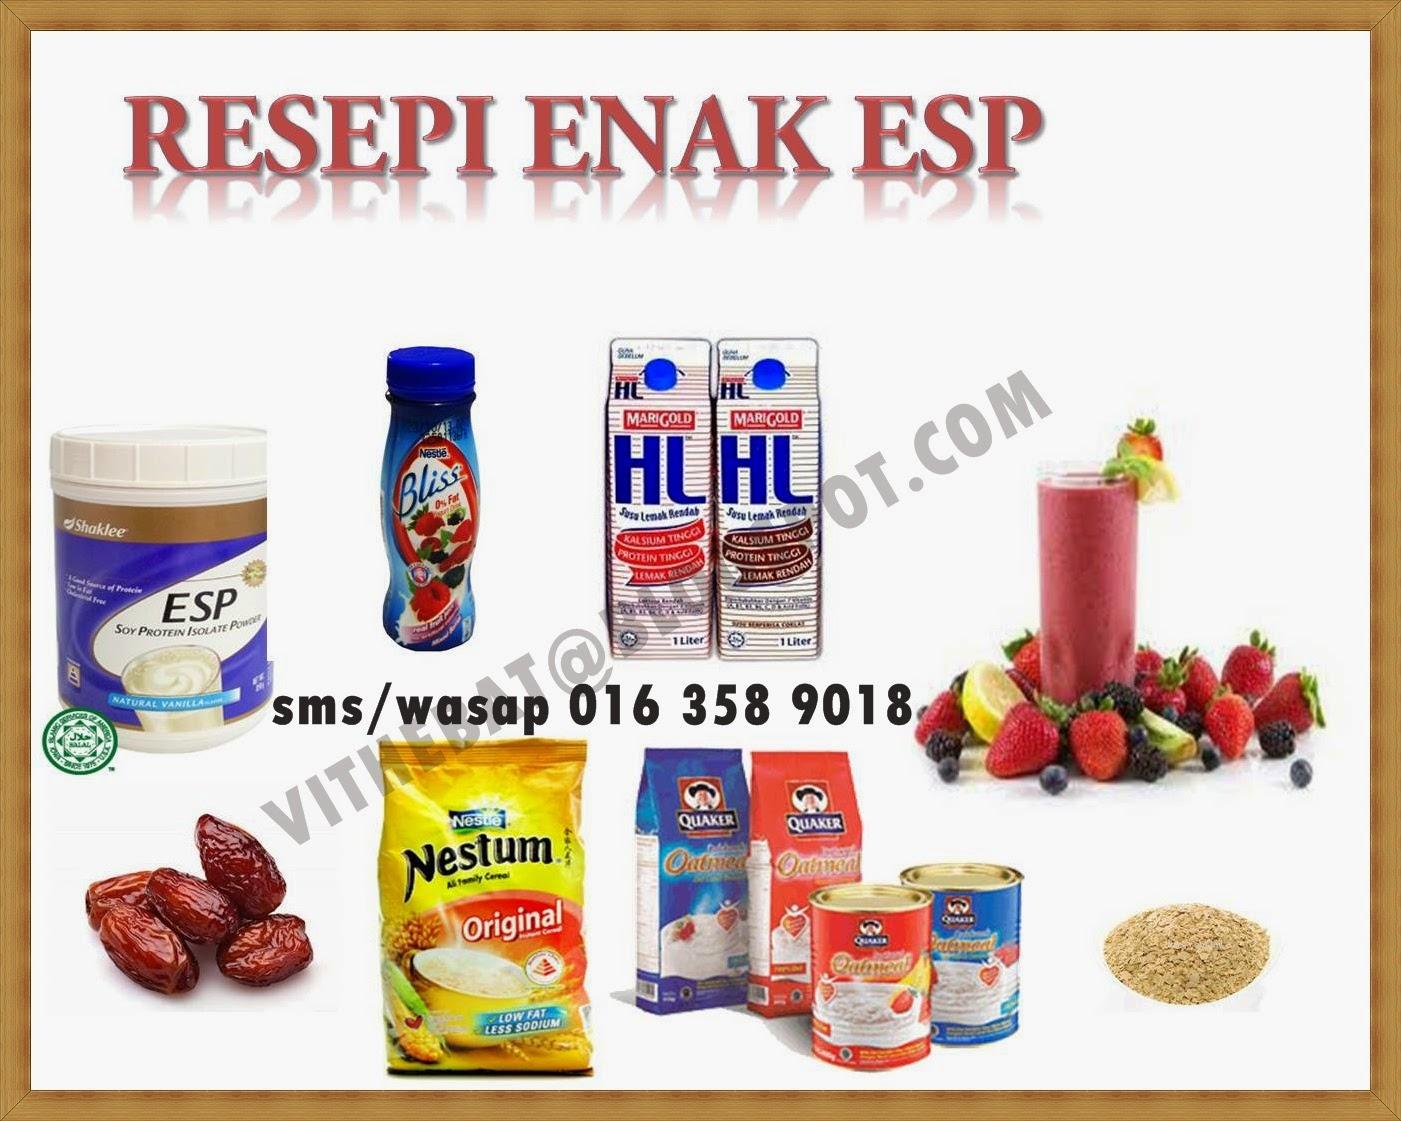 resepi enak ESP shaklee